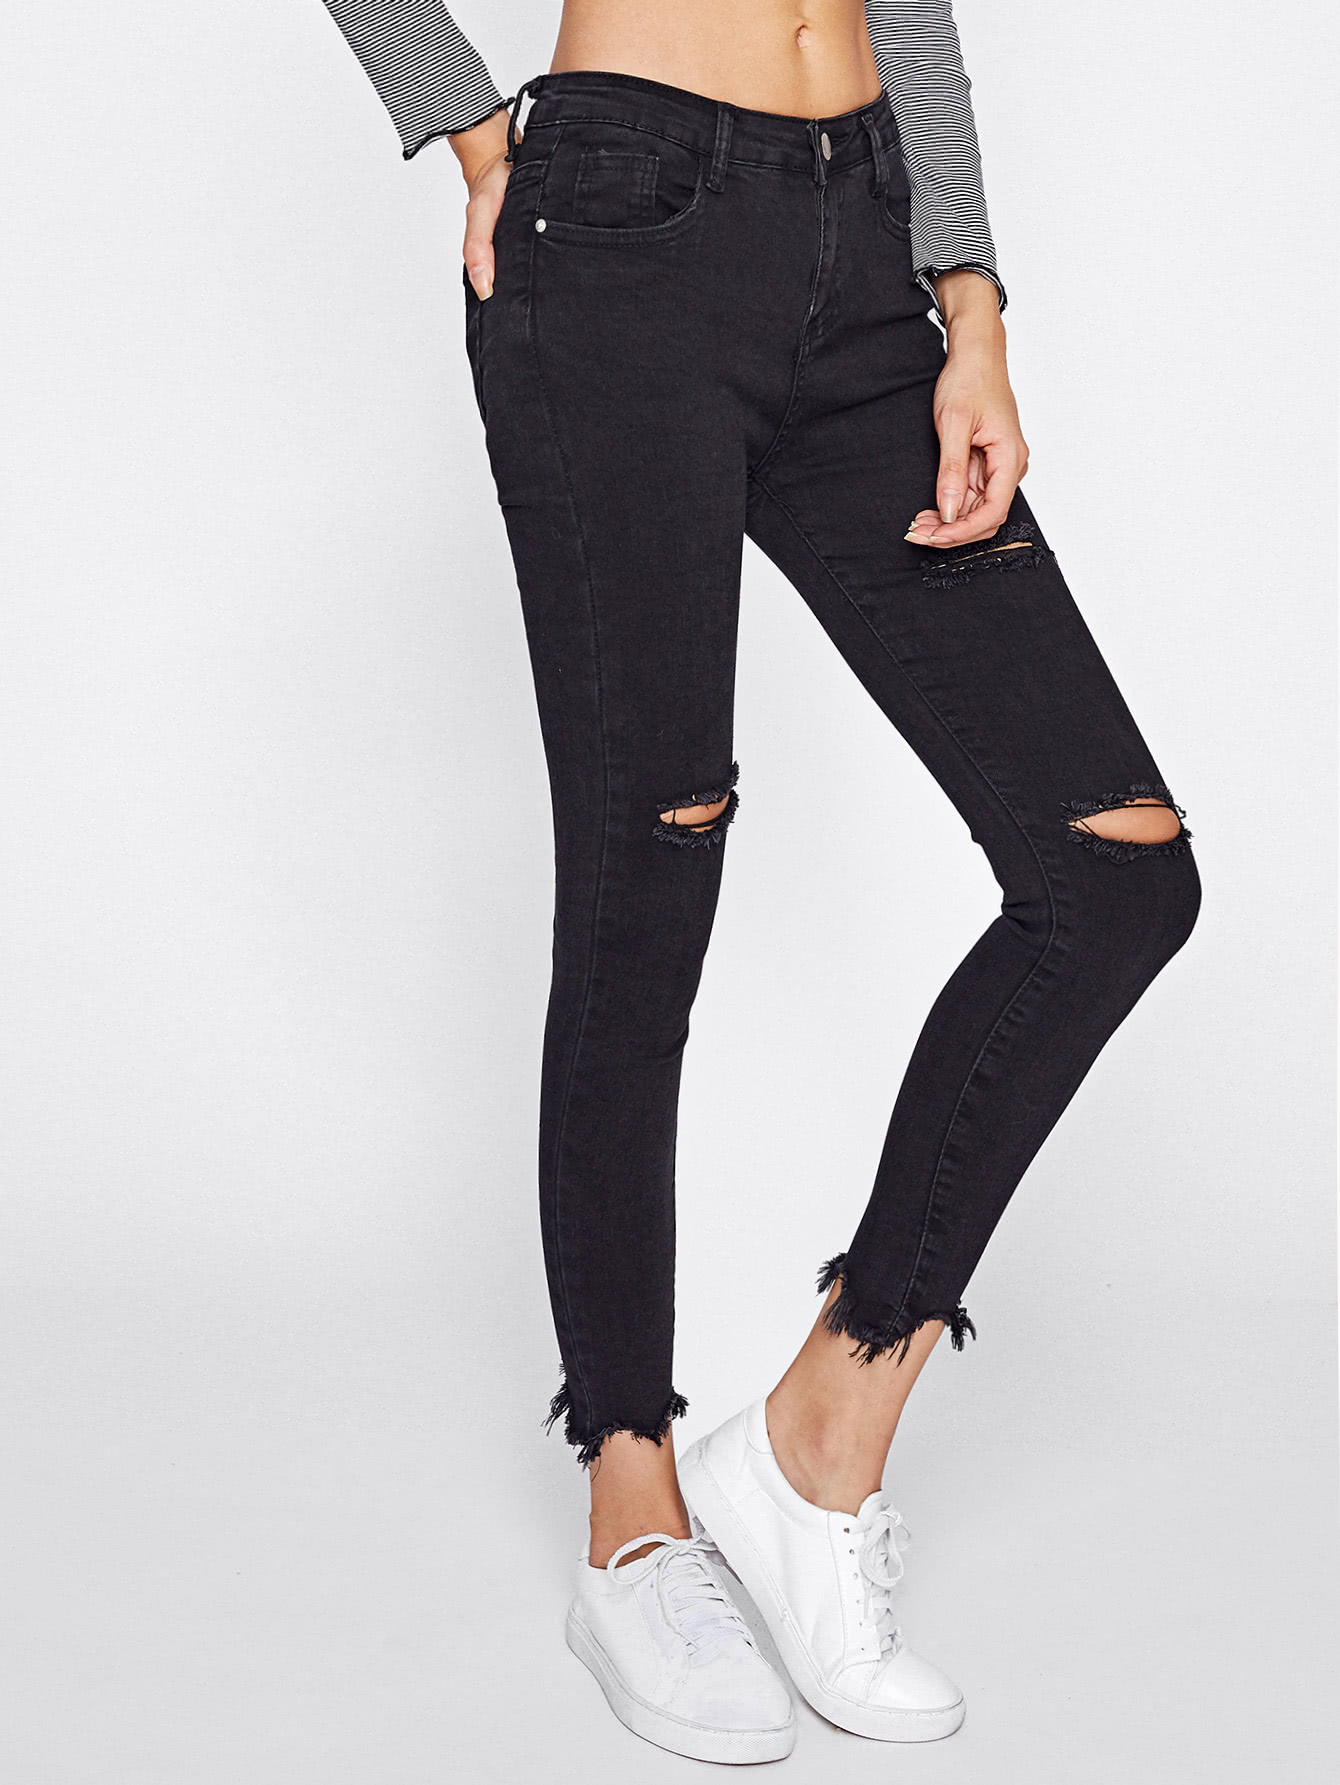 Distressed Frayed Hem Skinny Jeans embroidered distressed skinny jeans